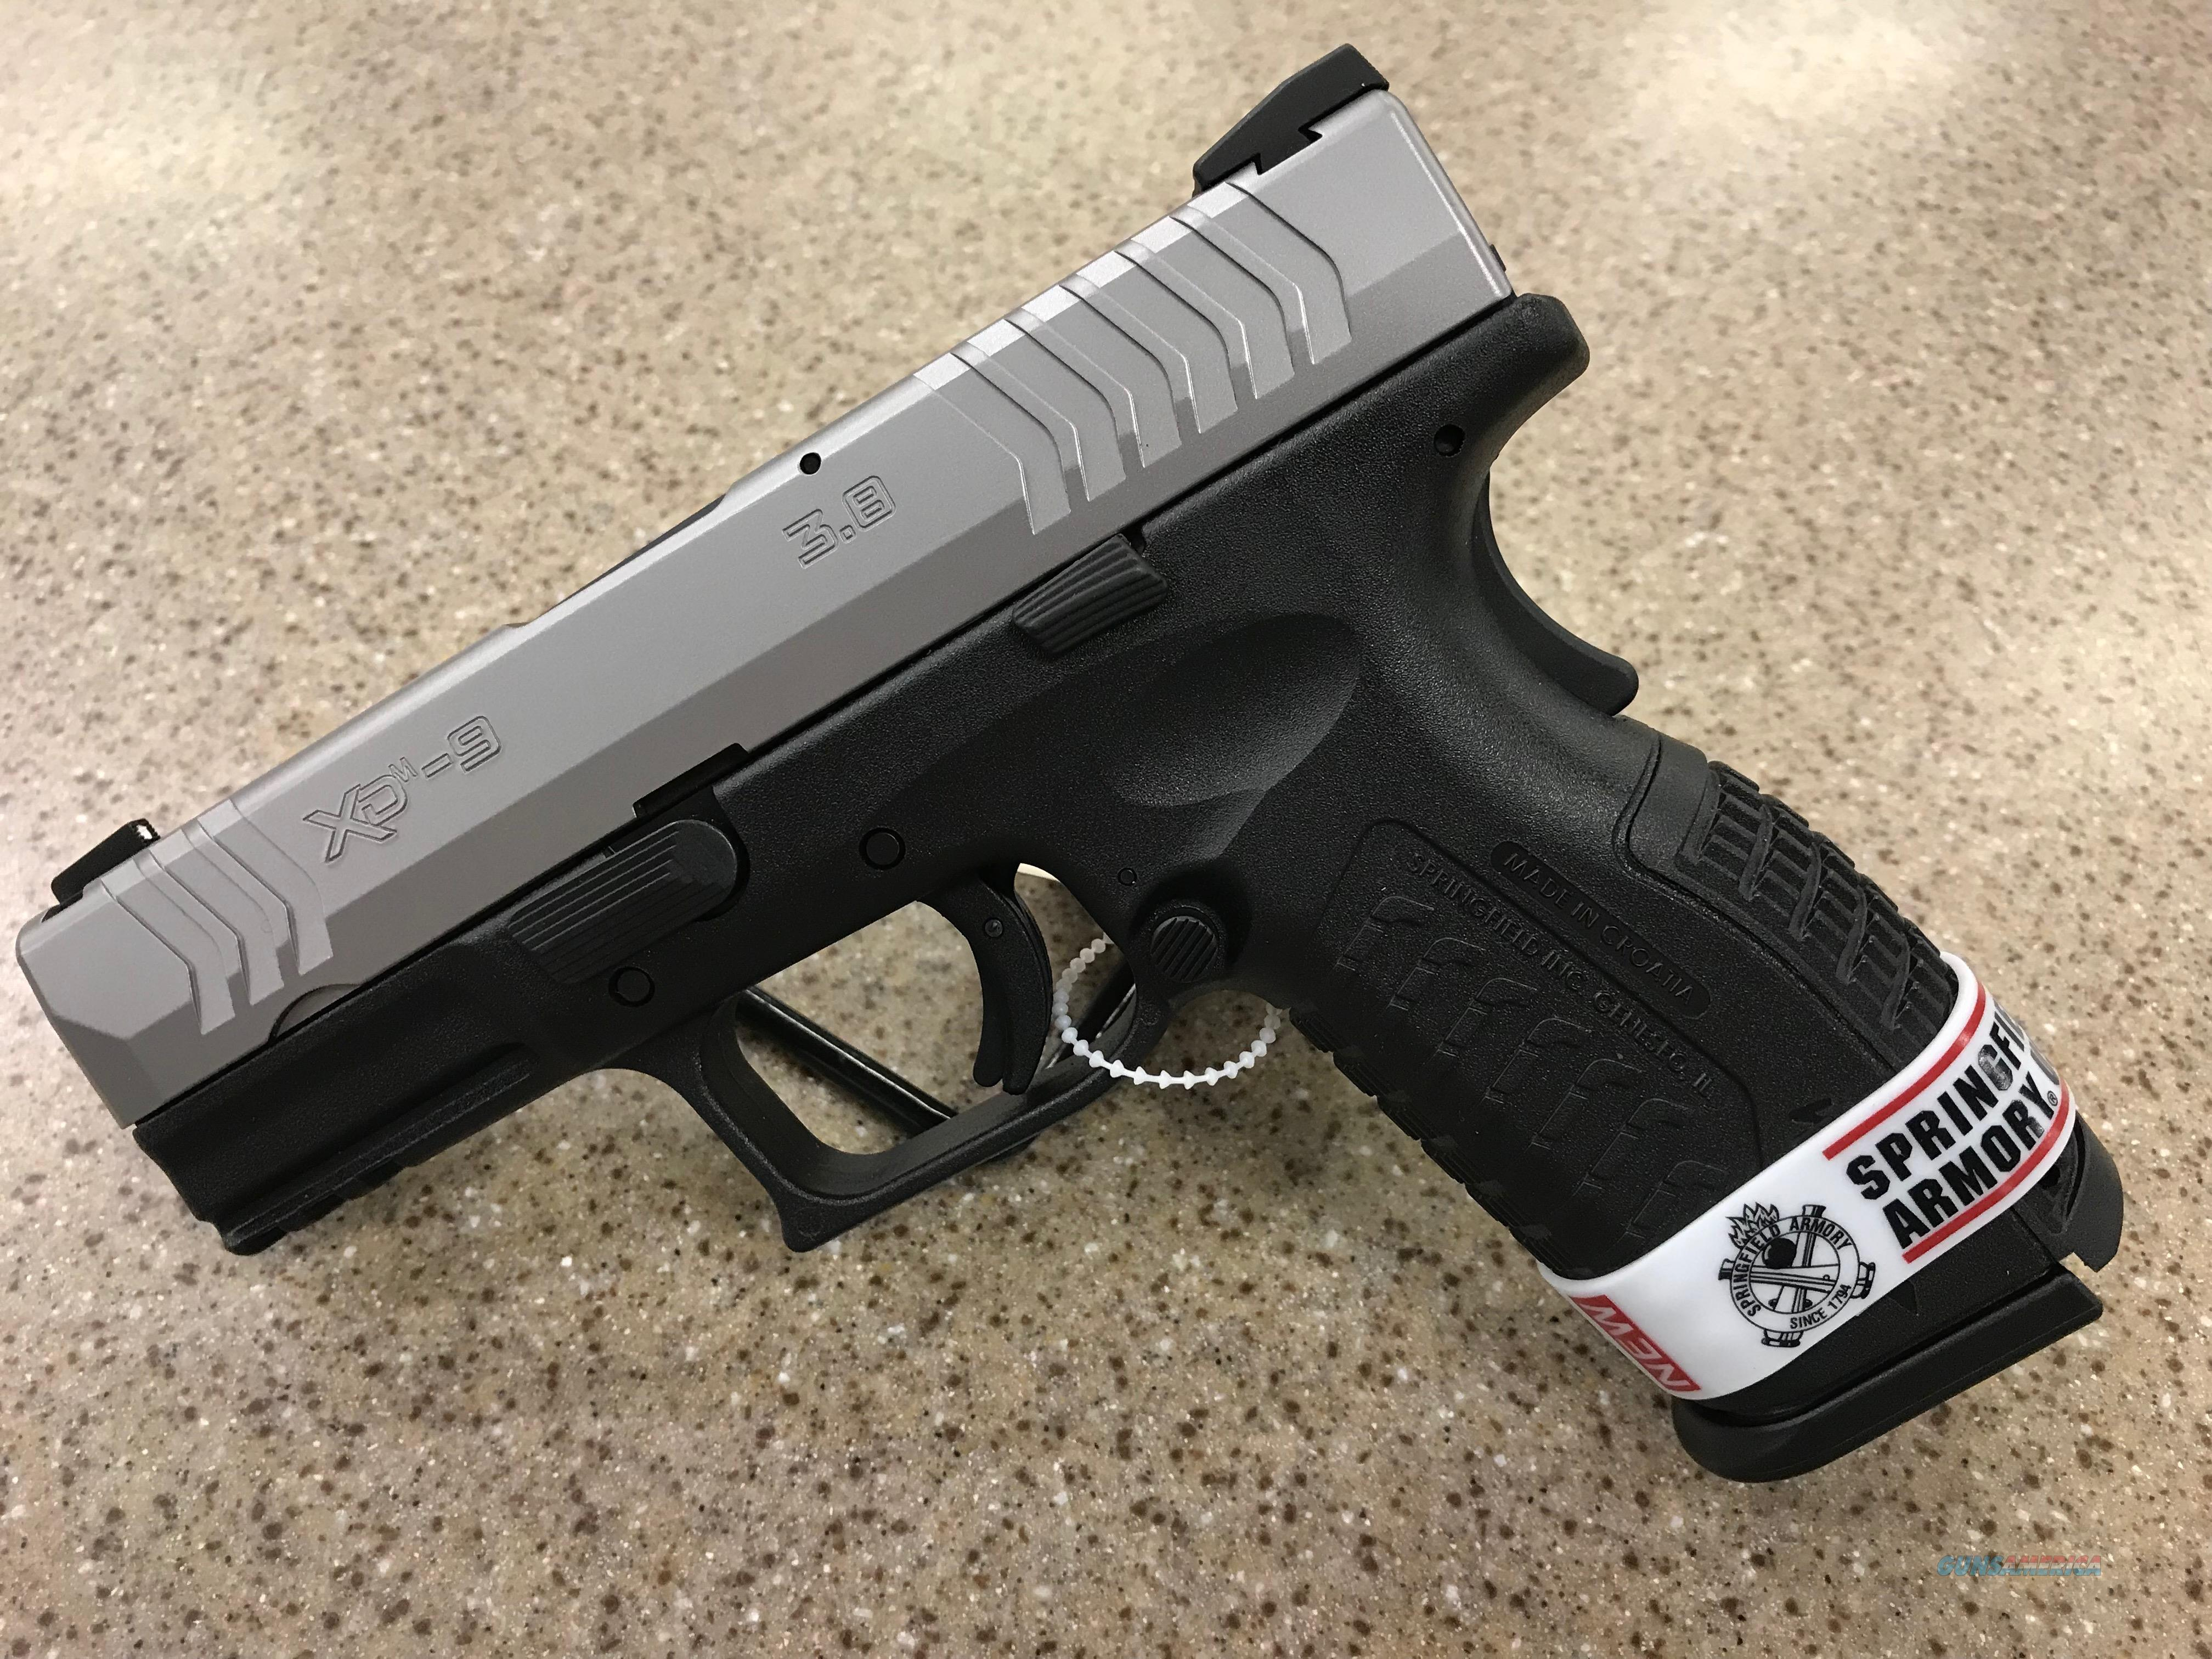 Springfield XDM 9mm with Gear Pack   Guns > Pistols > Springfield Armory Pistols > XD-M